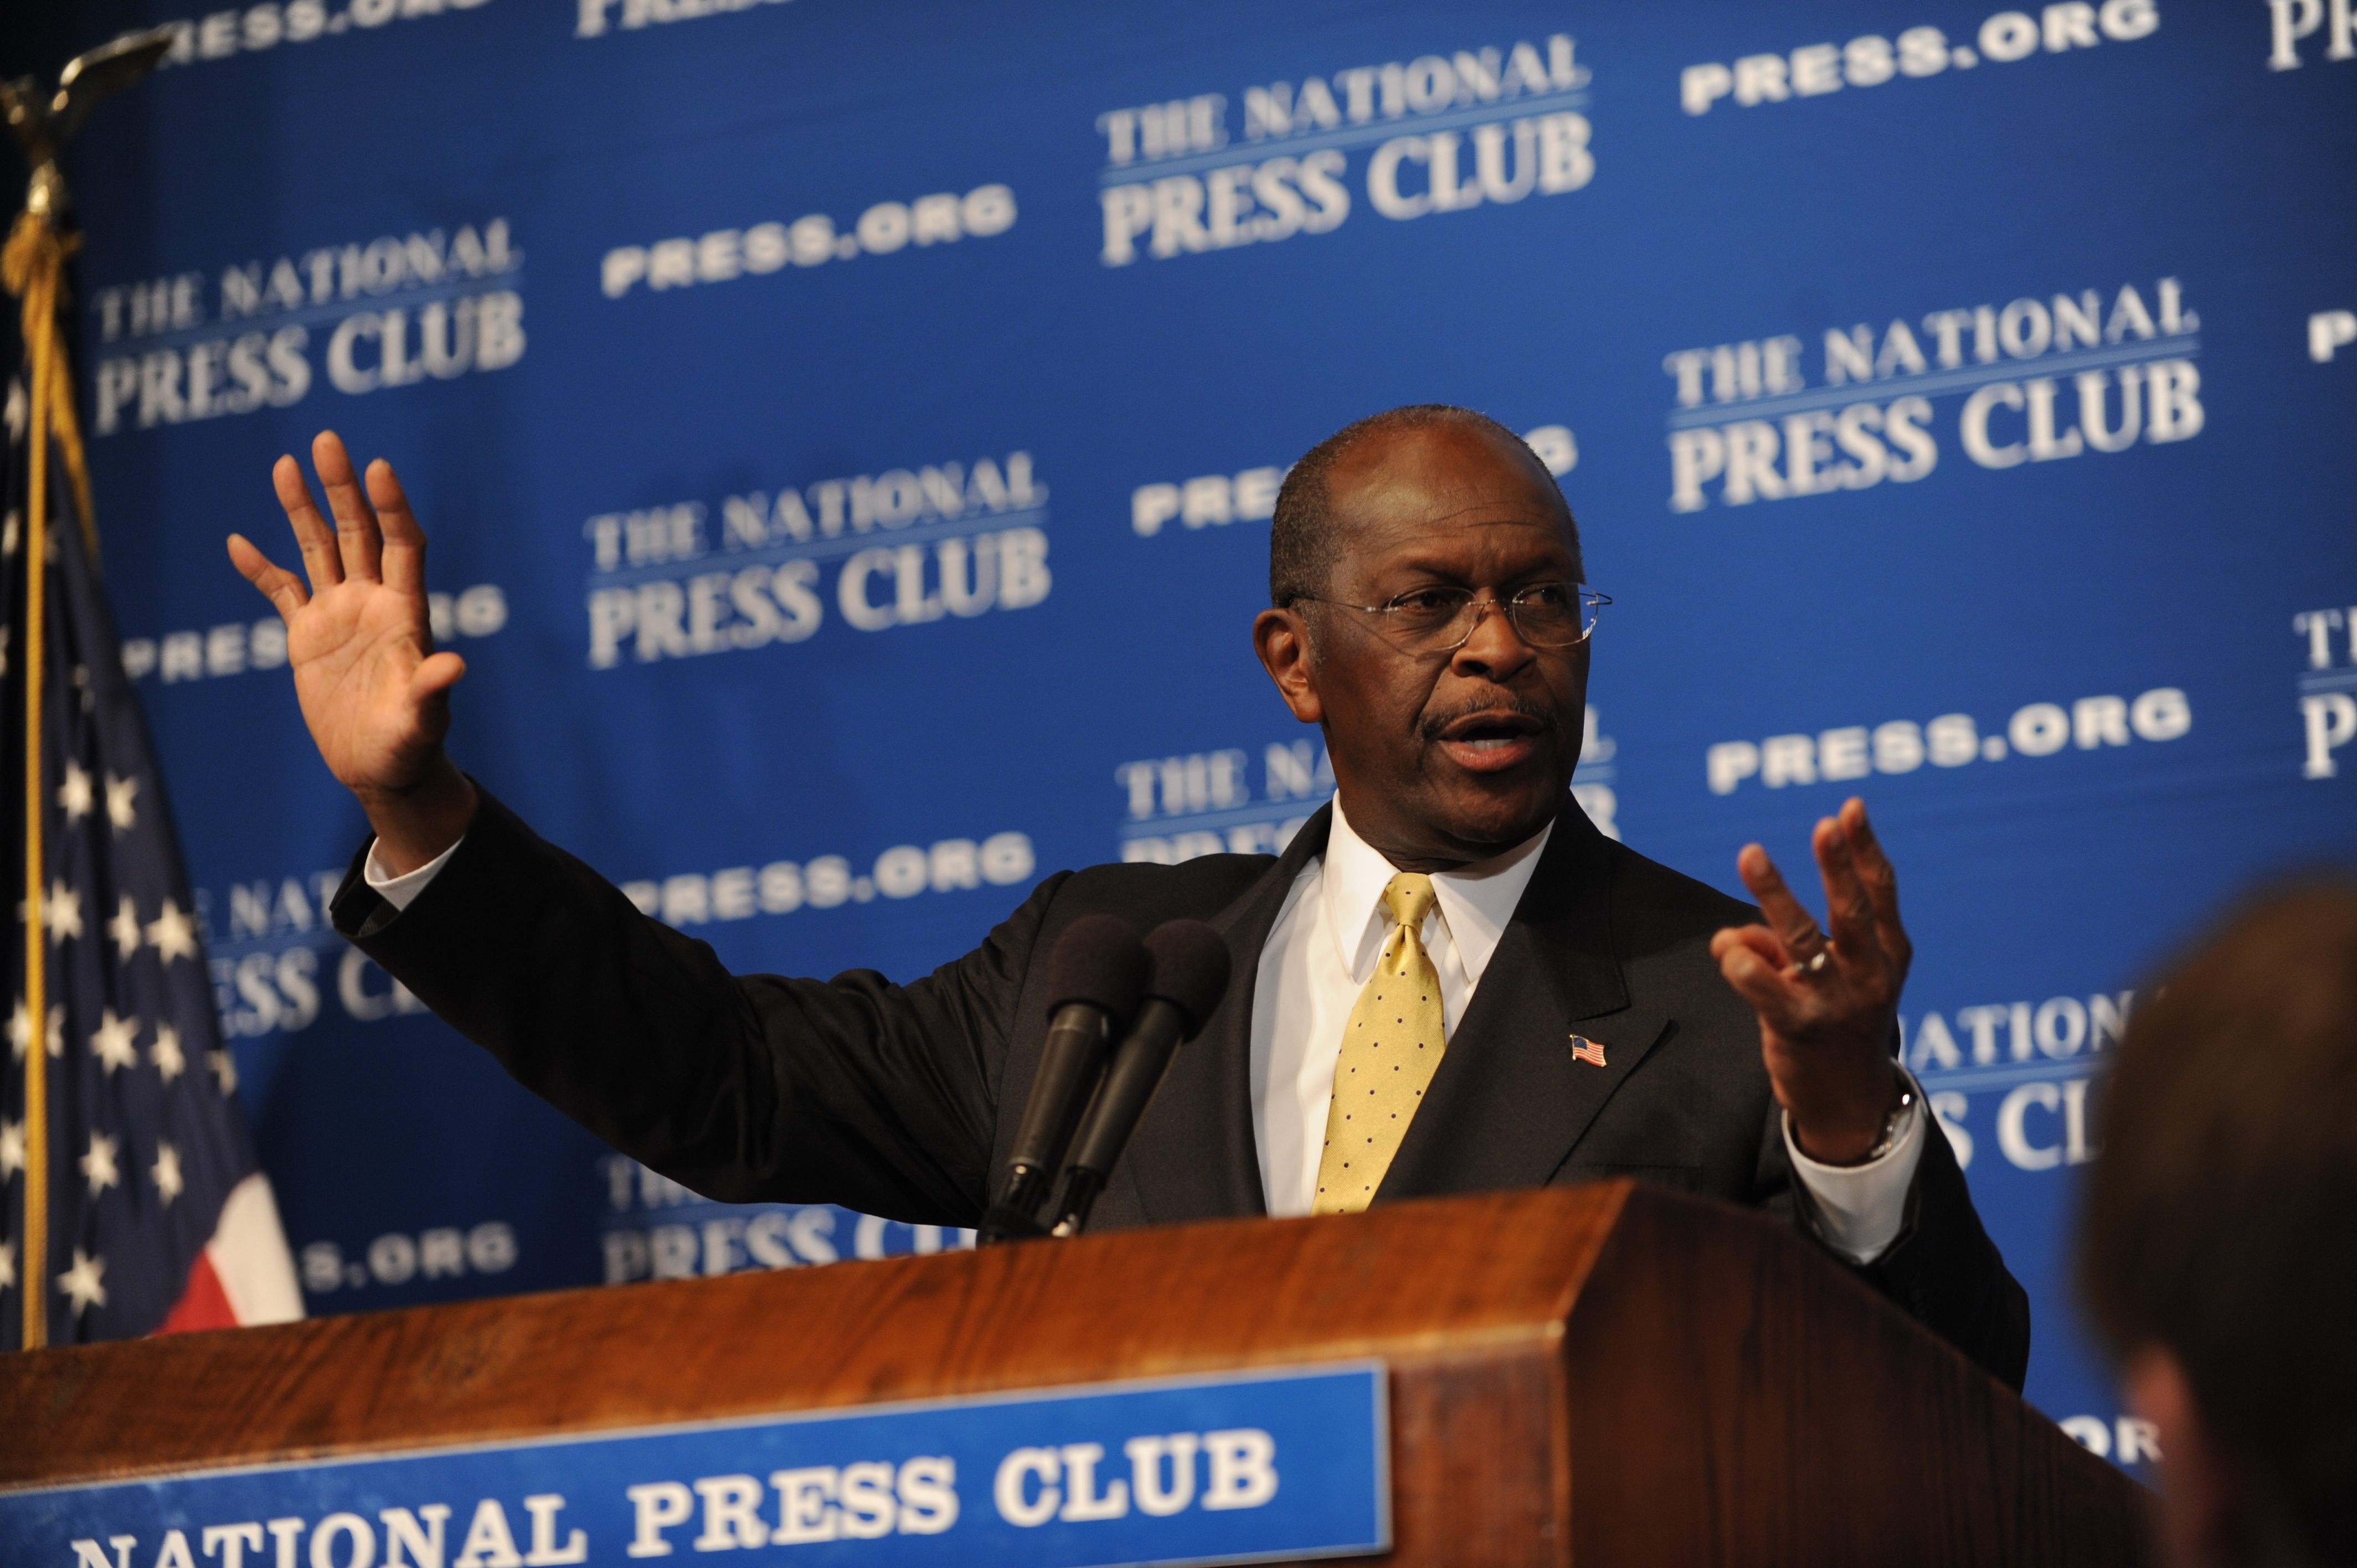 USA - 2012 Election - Herman Cain at the National Press Club